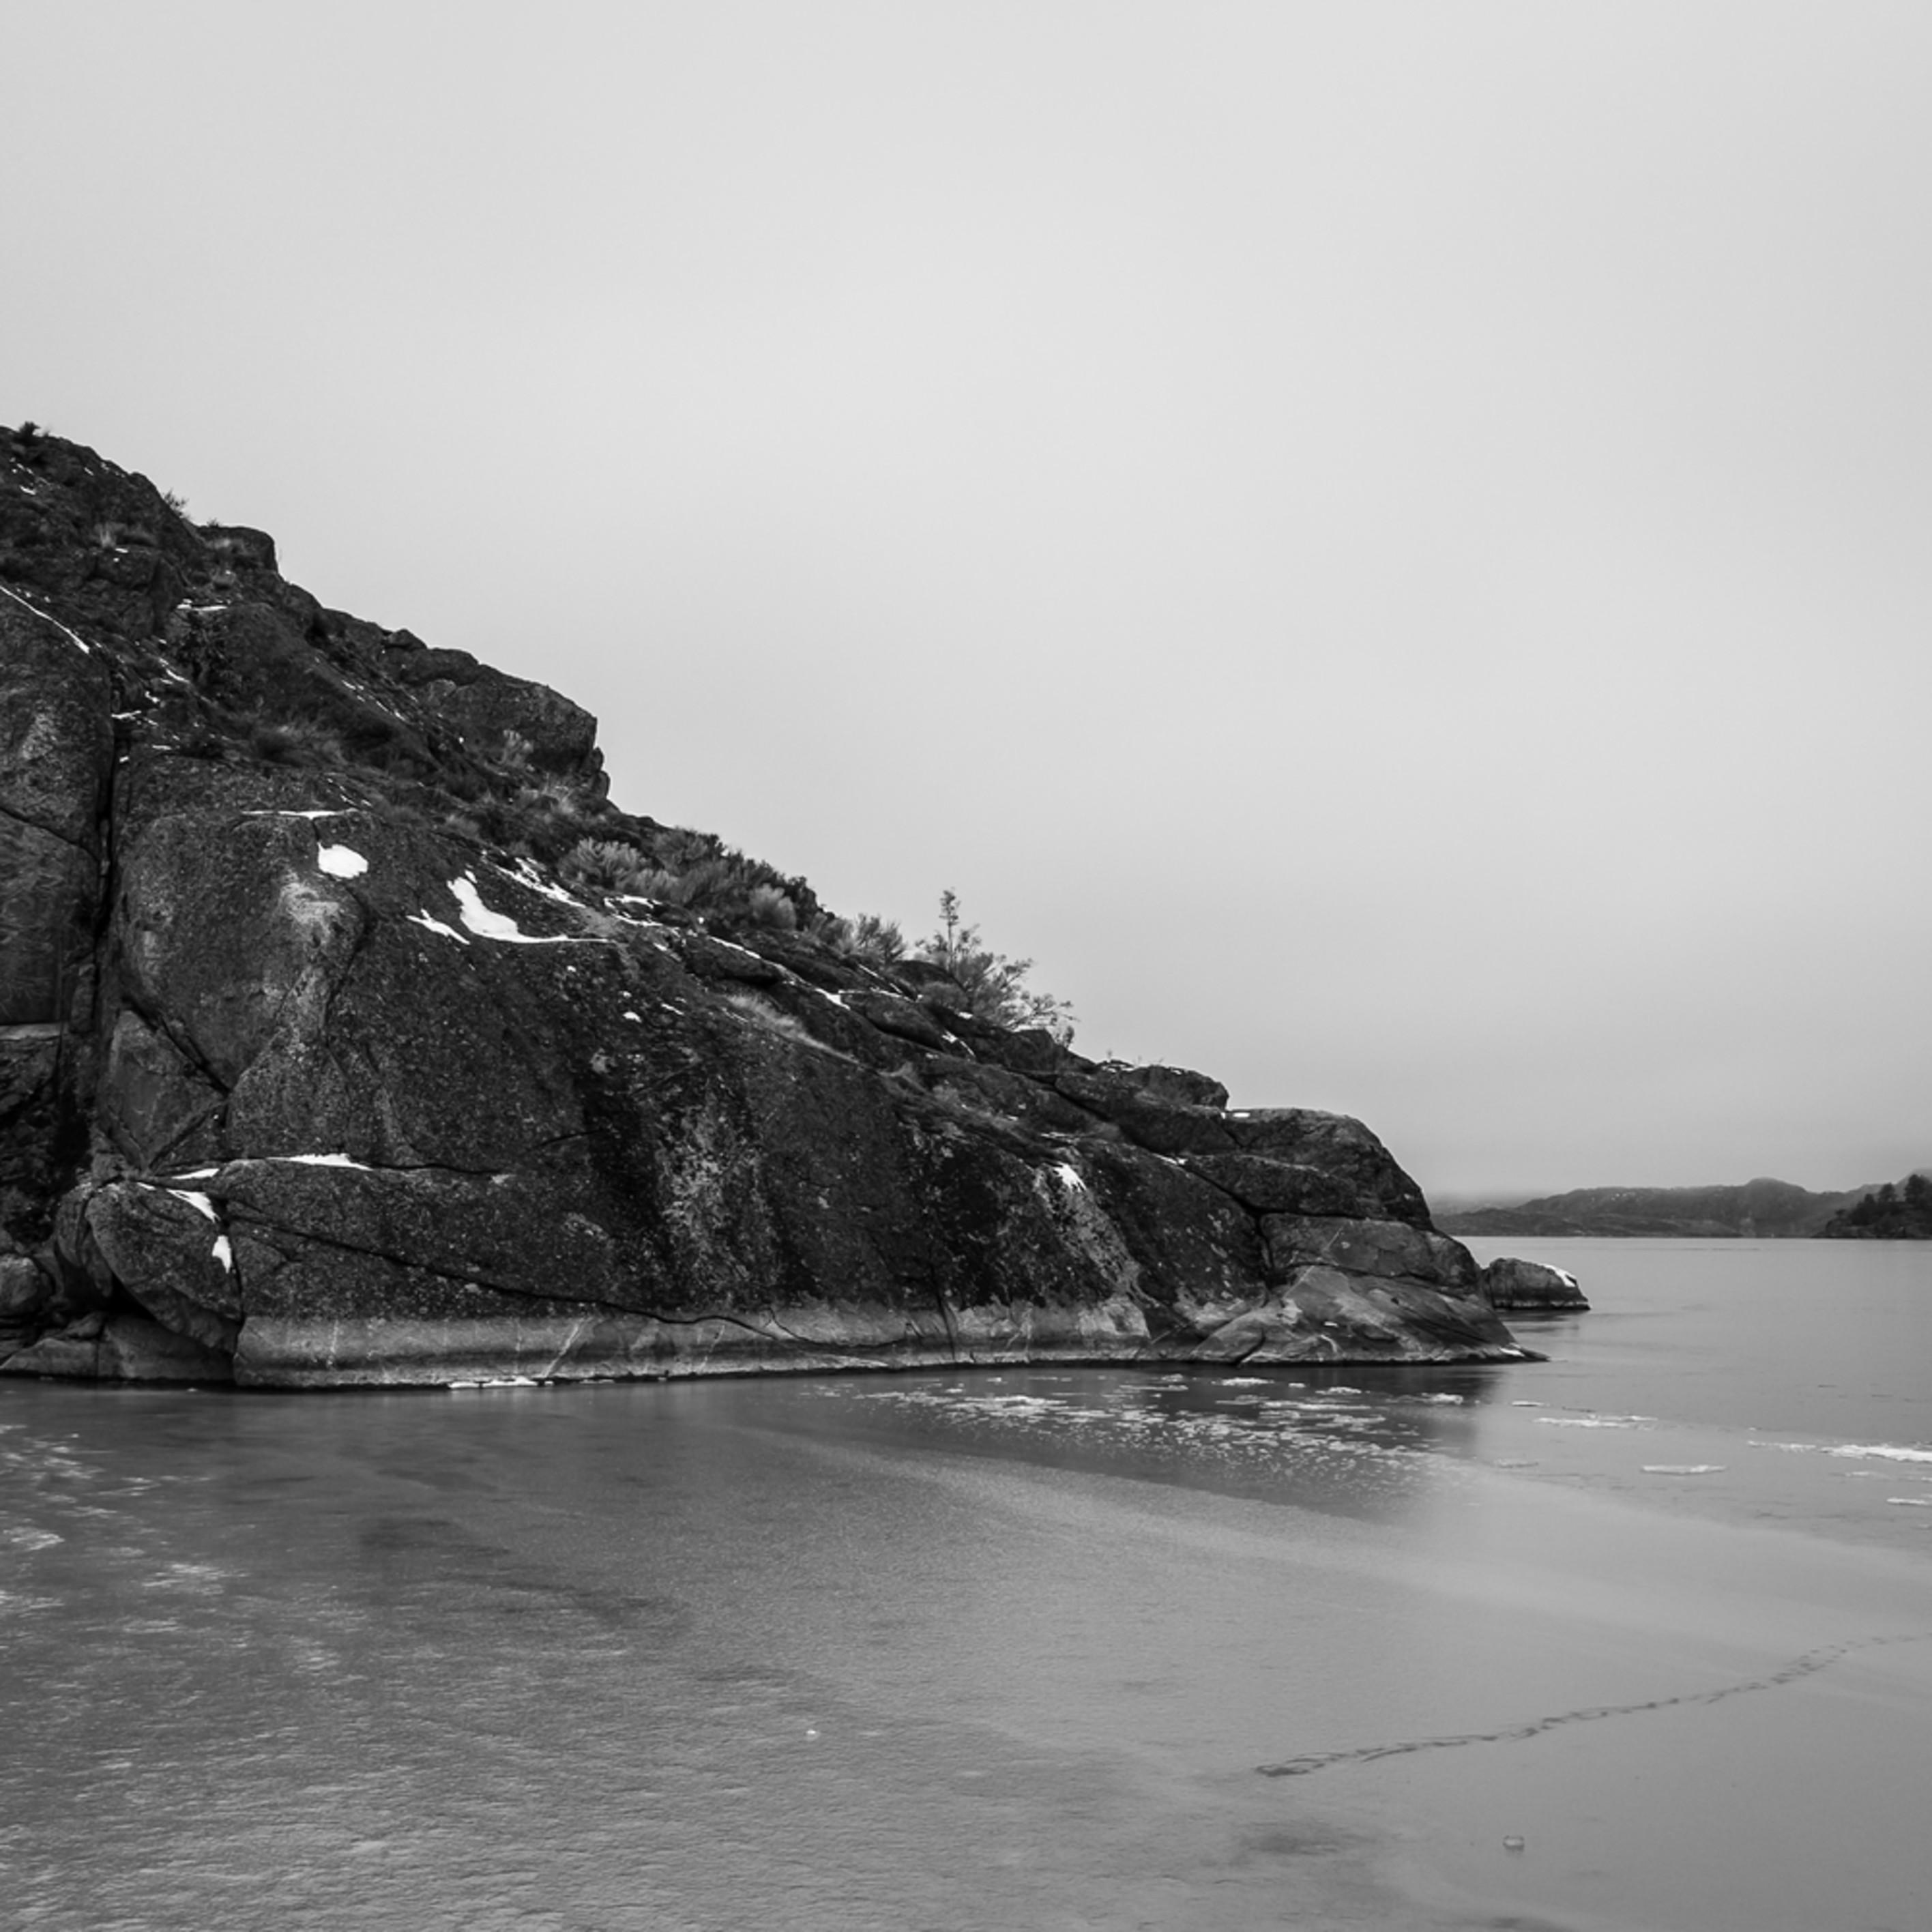 Deep freeze banks lake steamboat rock state park washington 2013 zrrv4g